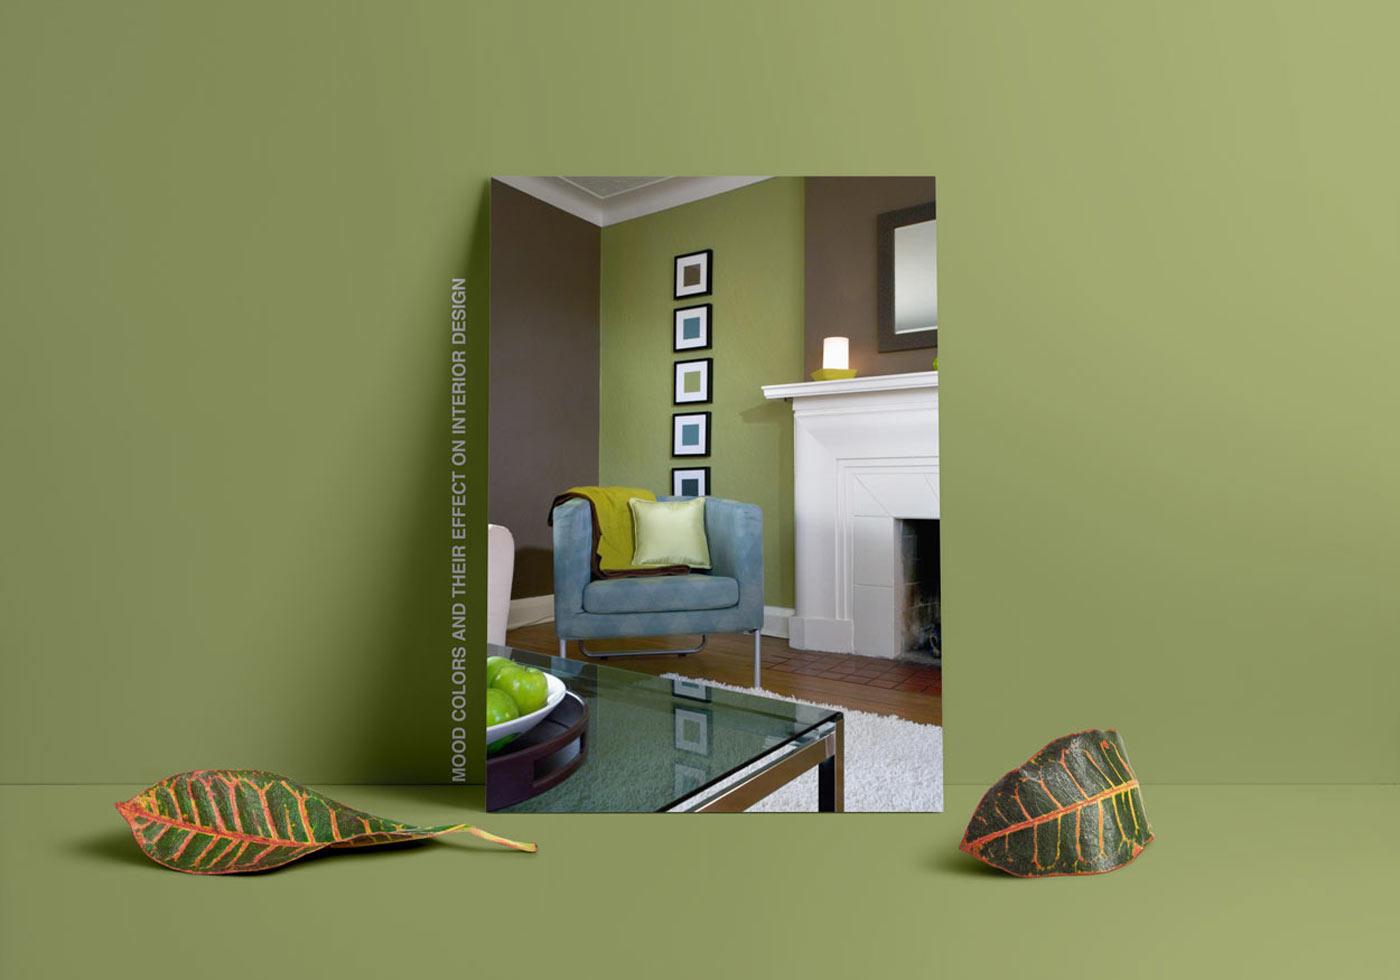 Mood Color - طبع یا مزاج رنگ ها در دکوراسیون داخلی